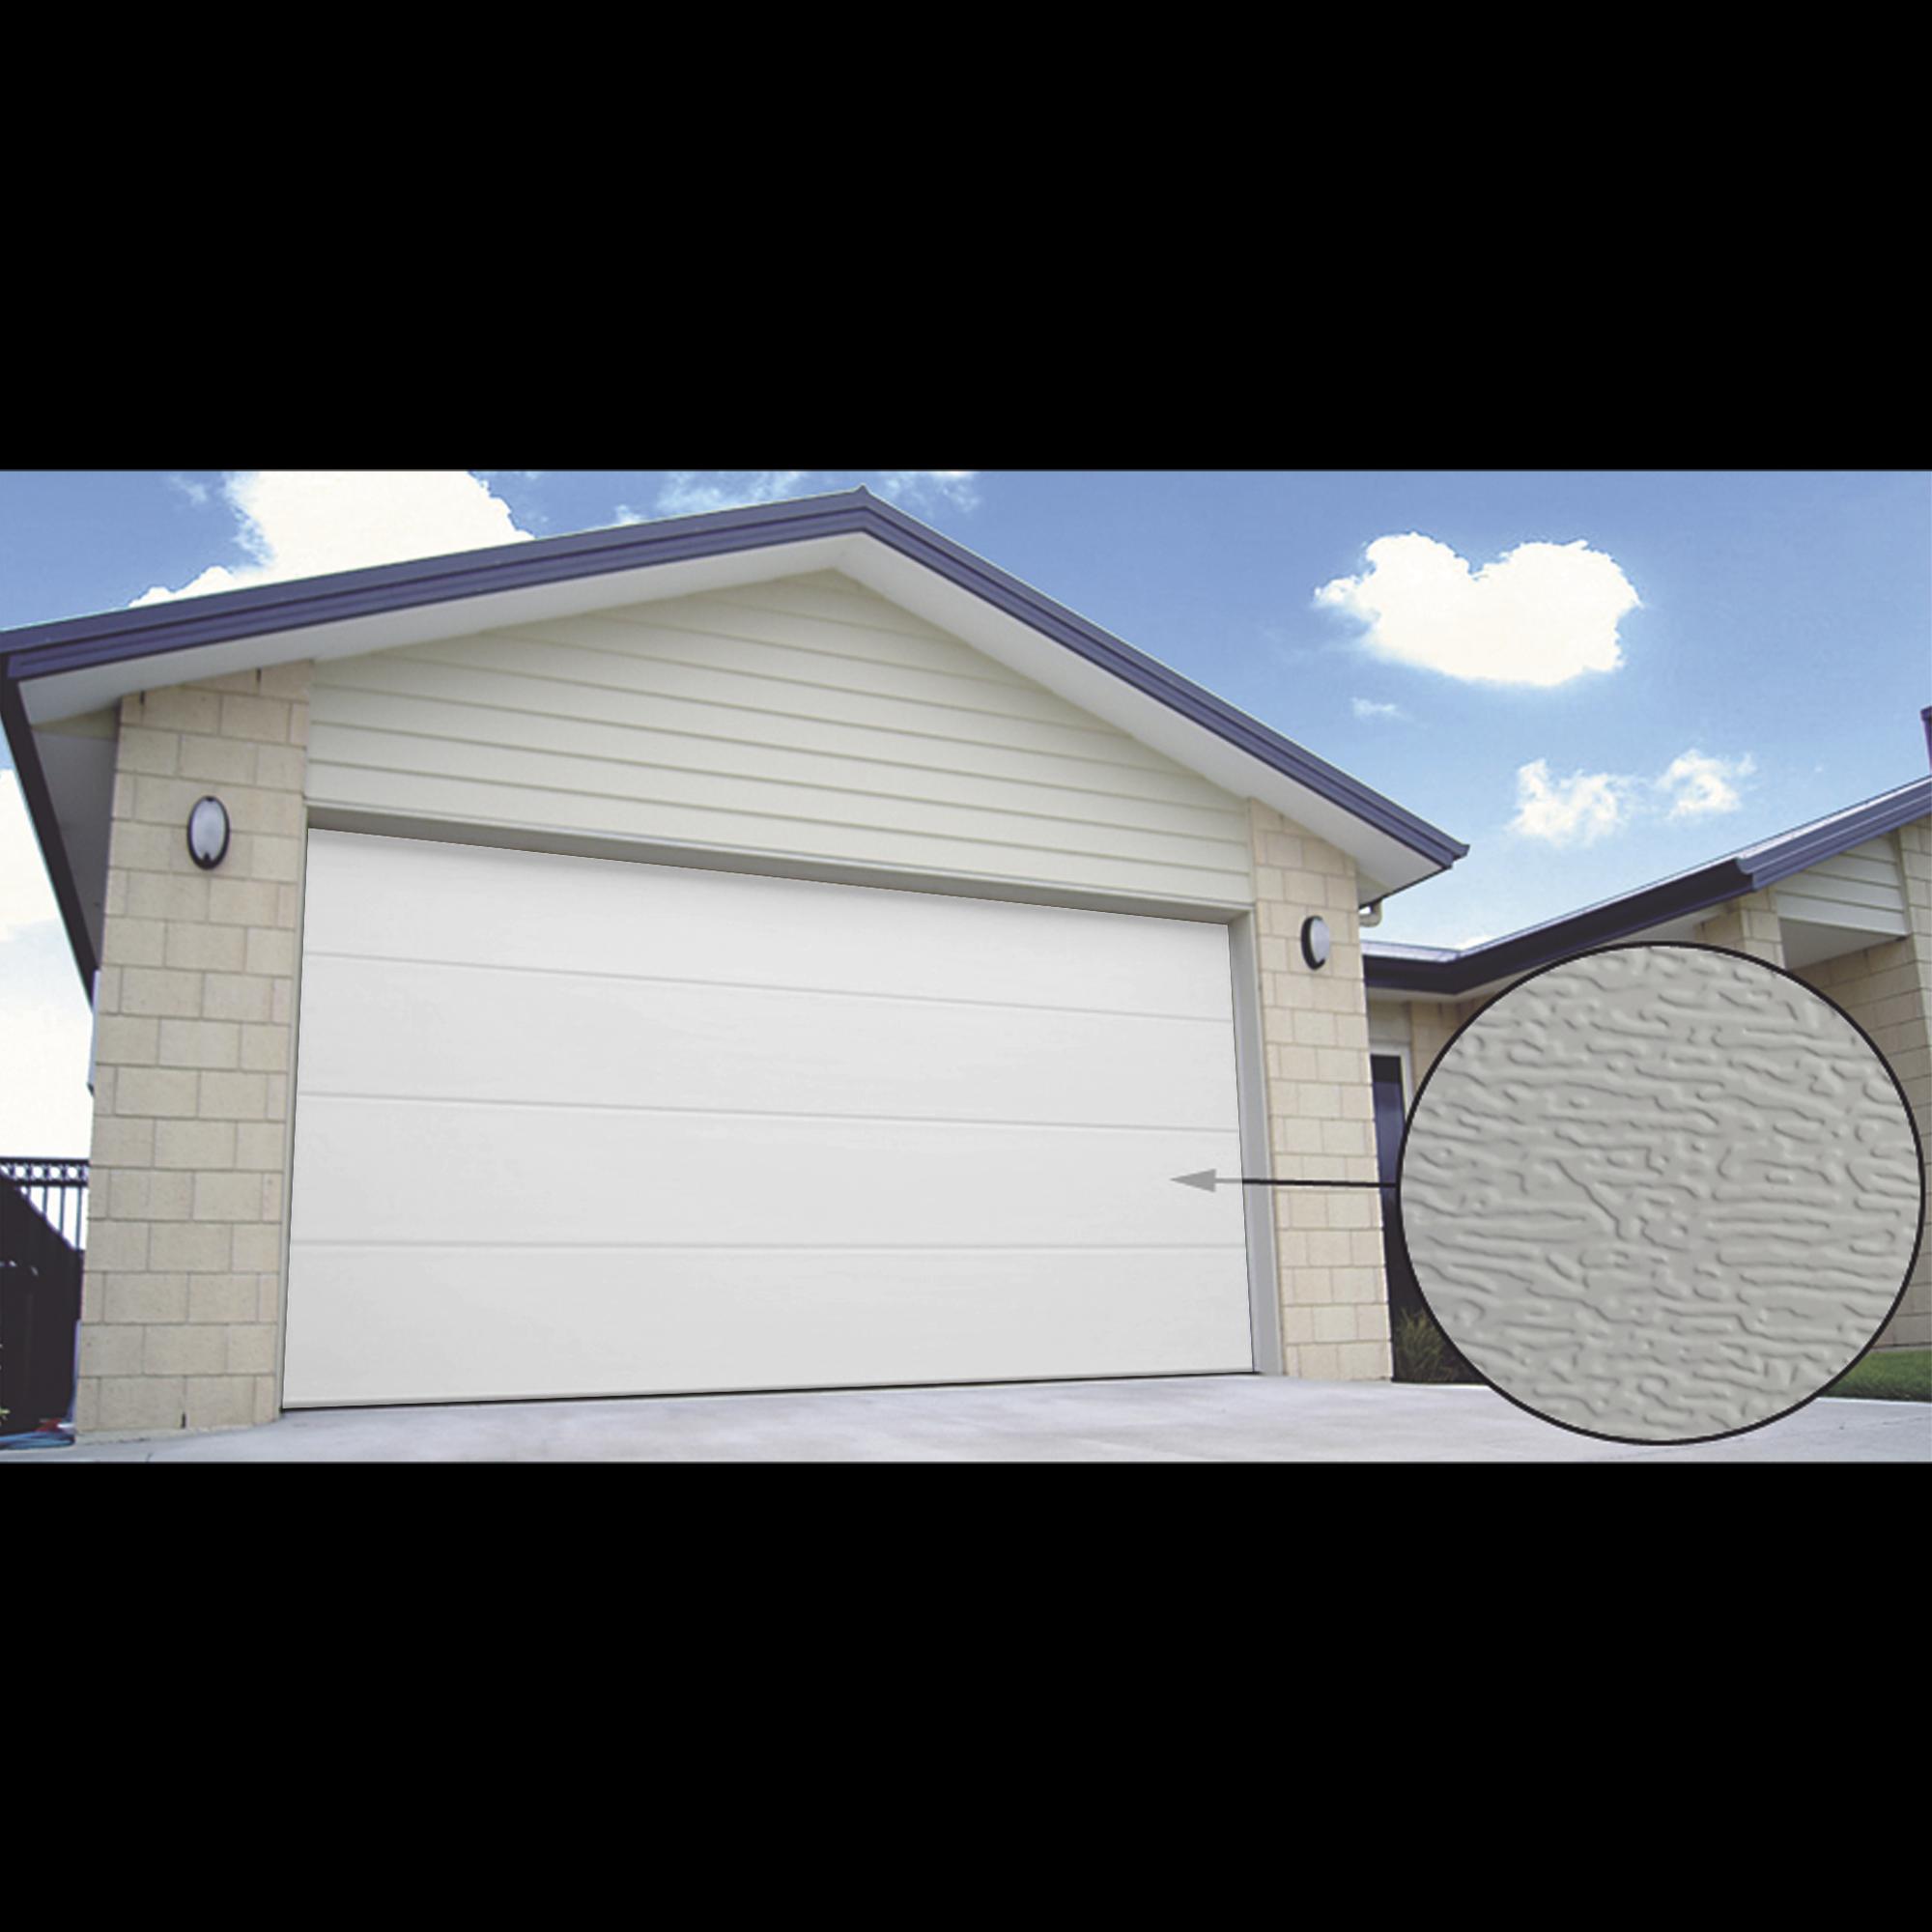 Puerta de Garage PREMIUM, Lisa color blanco   20X8 FT,  AISLADA, Estilo U.S.A.